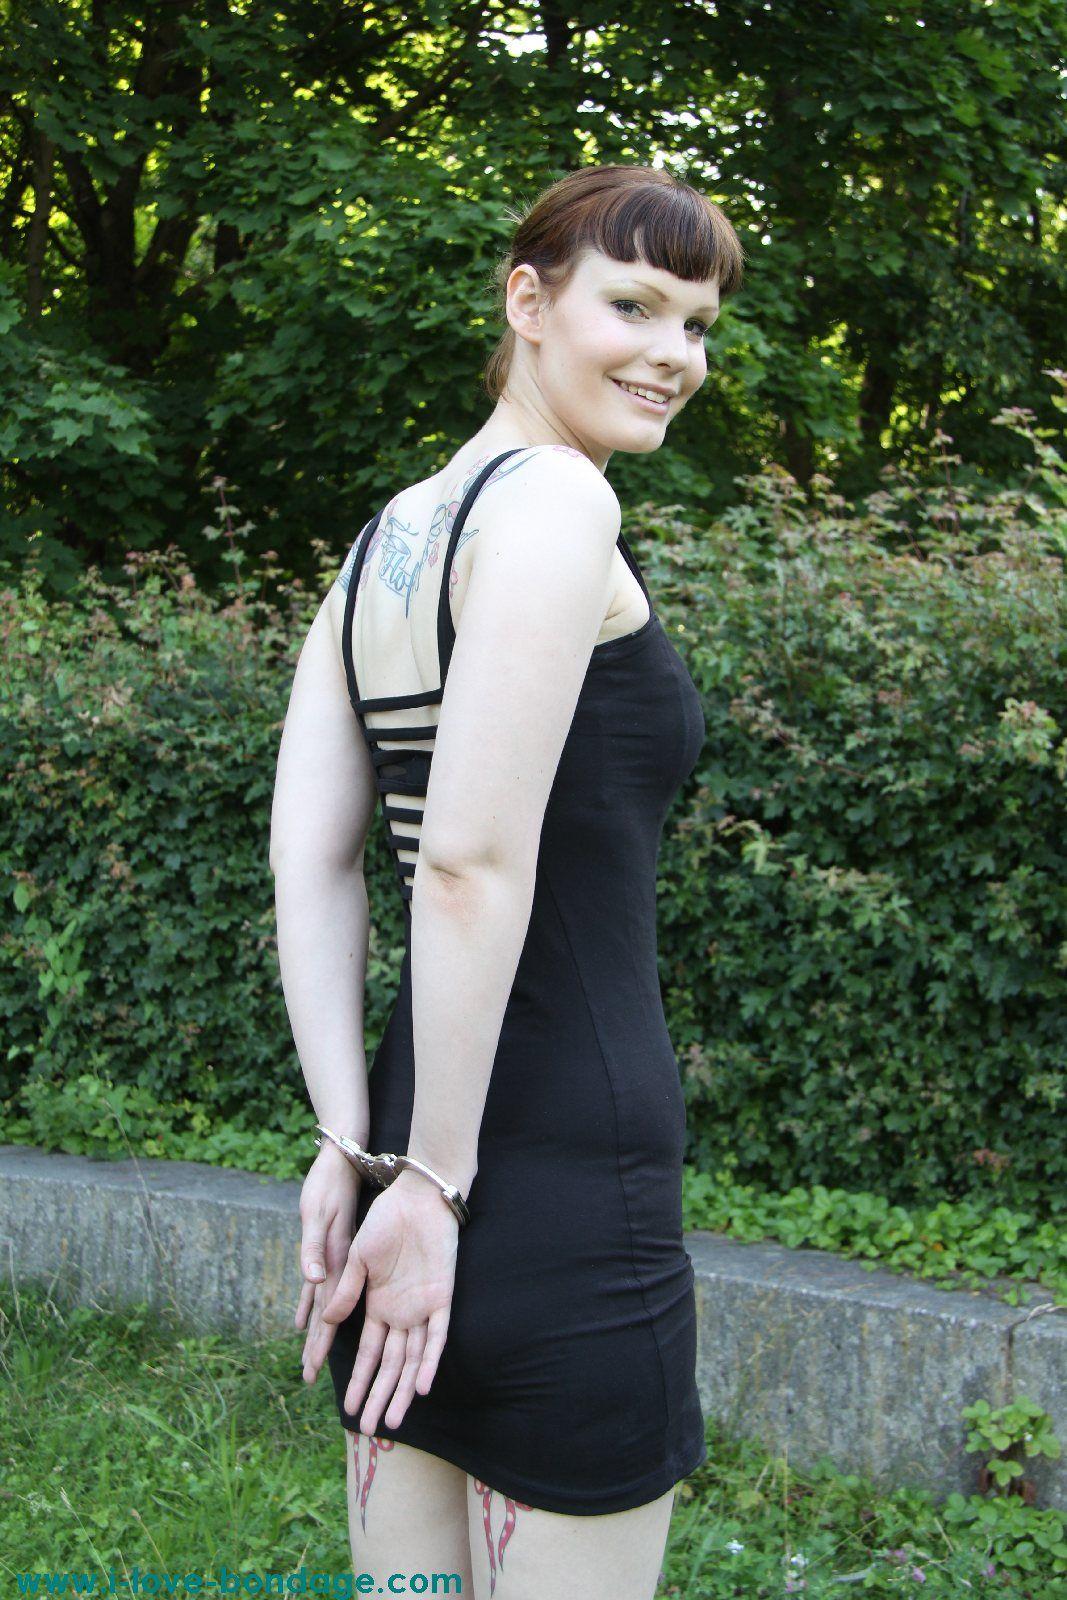 Woman Handcuffed Walk Handcuffs T